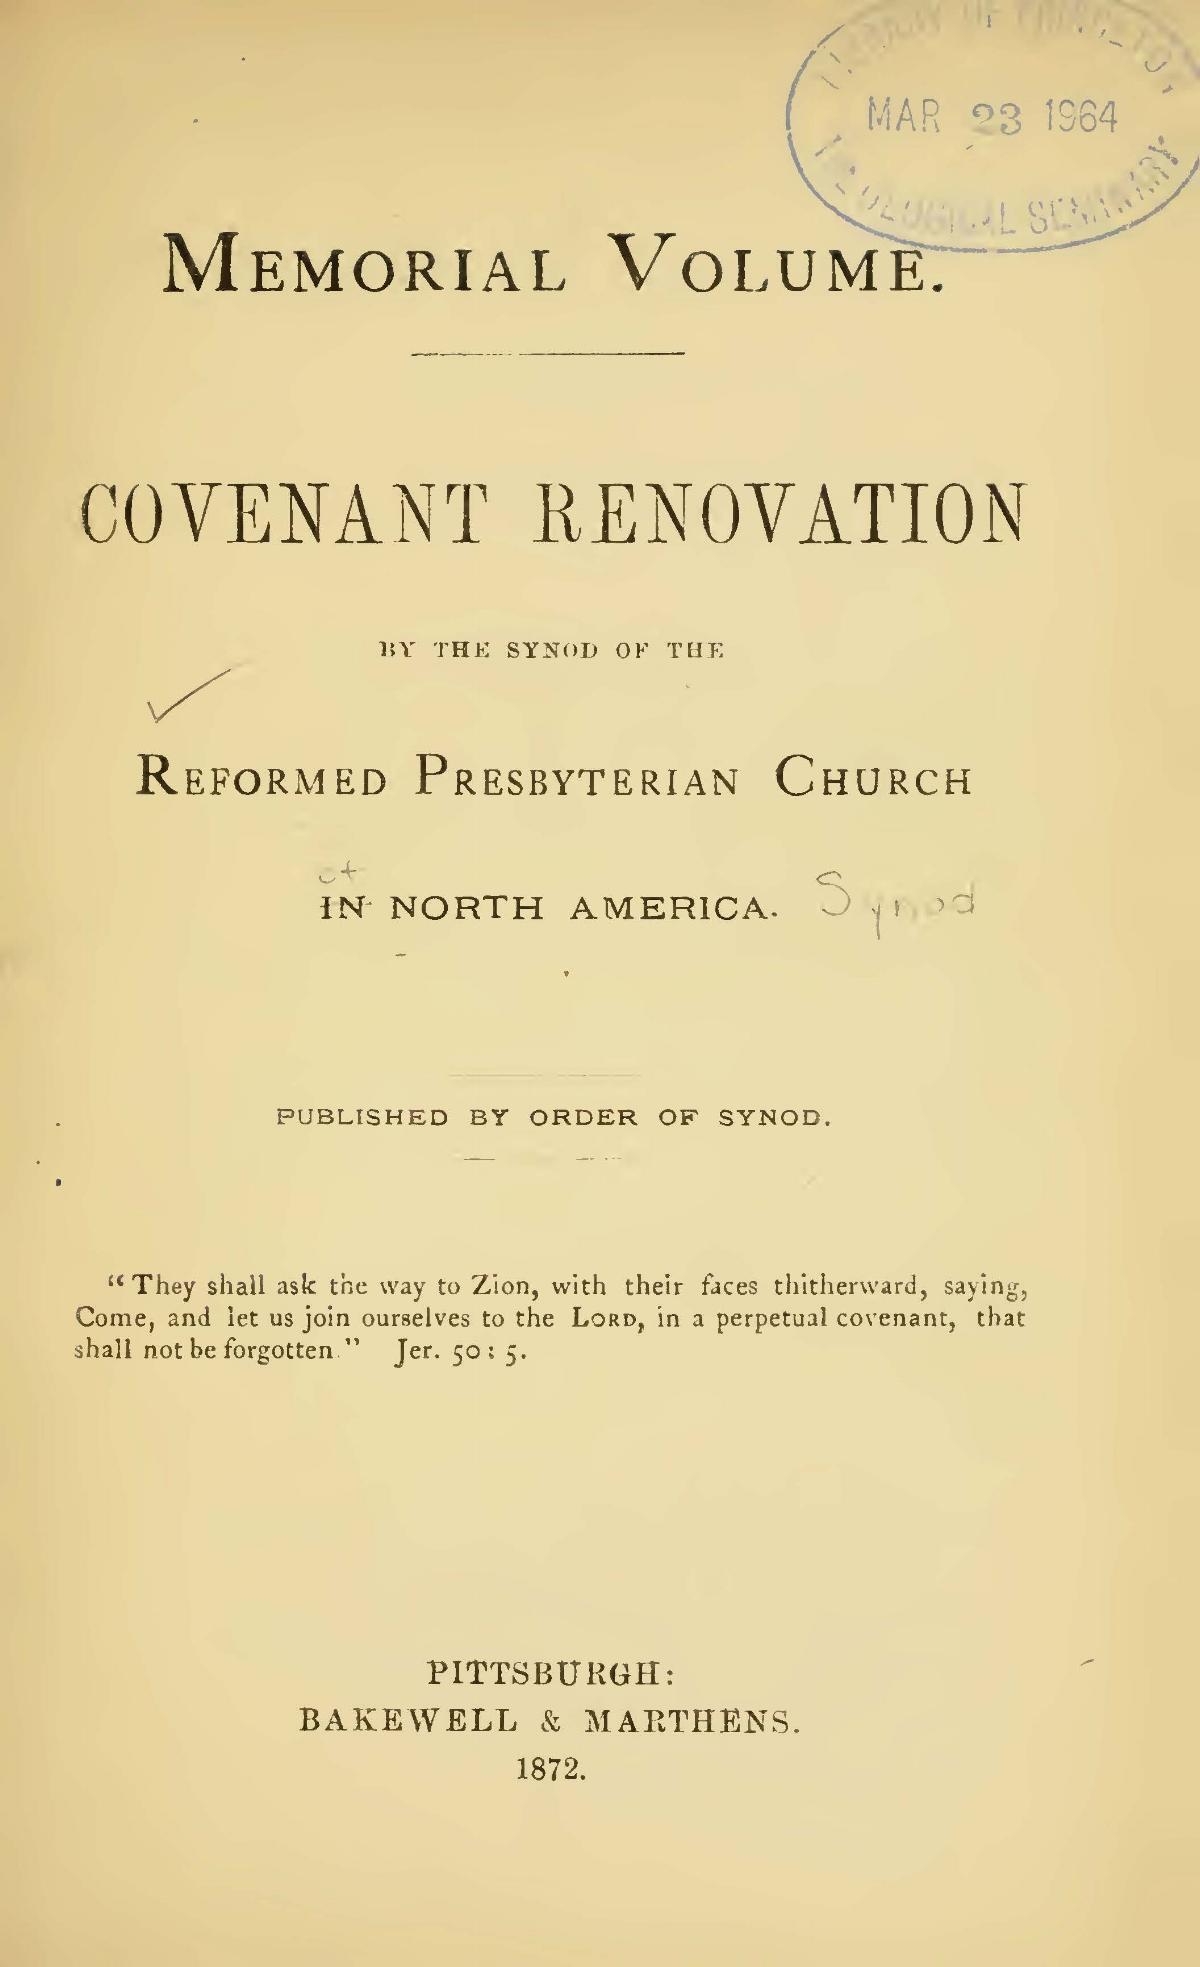 Sloane, James Renwick Wilson, Memorial Volume Covenant Renovation Title Page.jpg